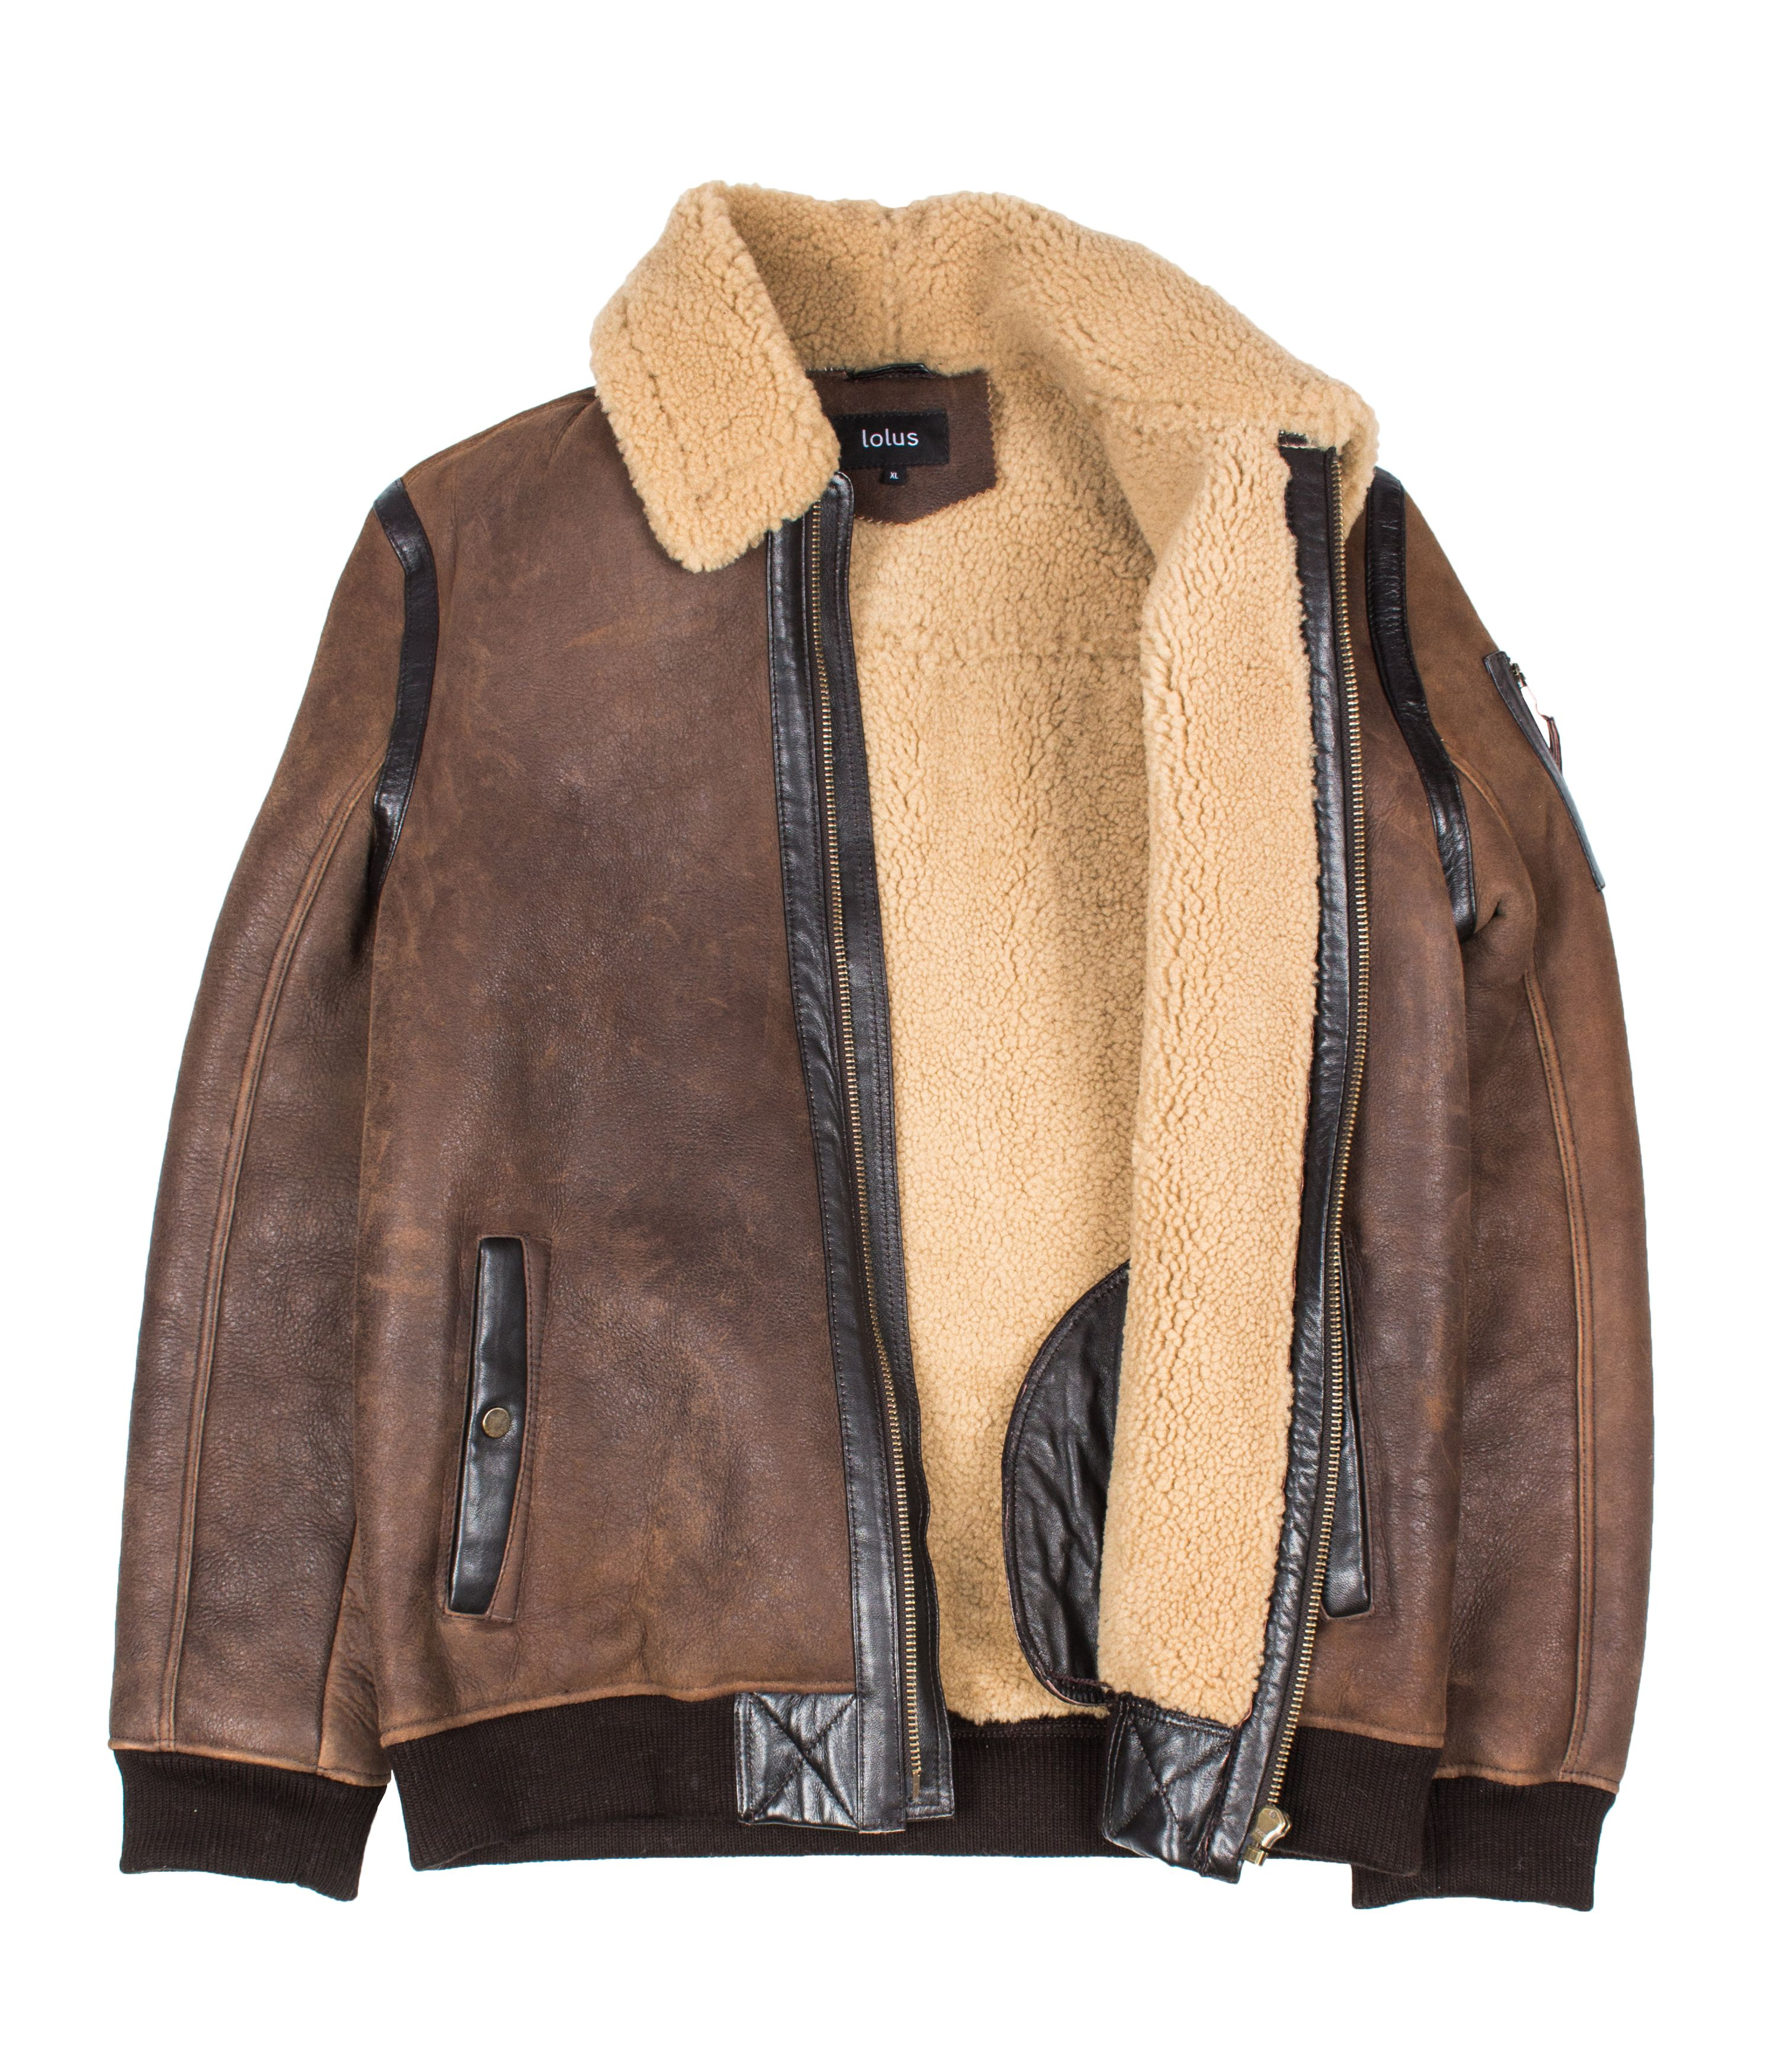 Lolus Hanx Lammfelljacke Shearling Jacket | Braune